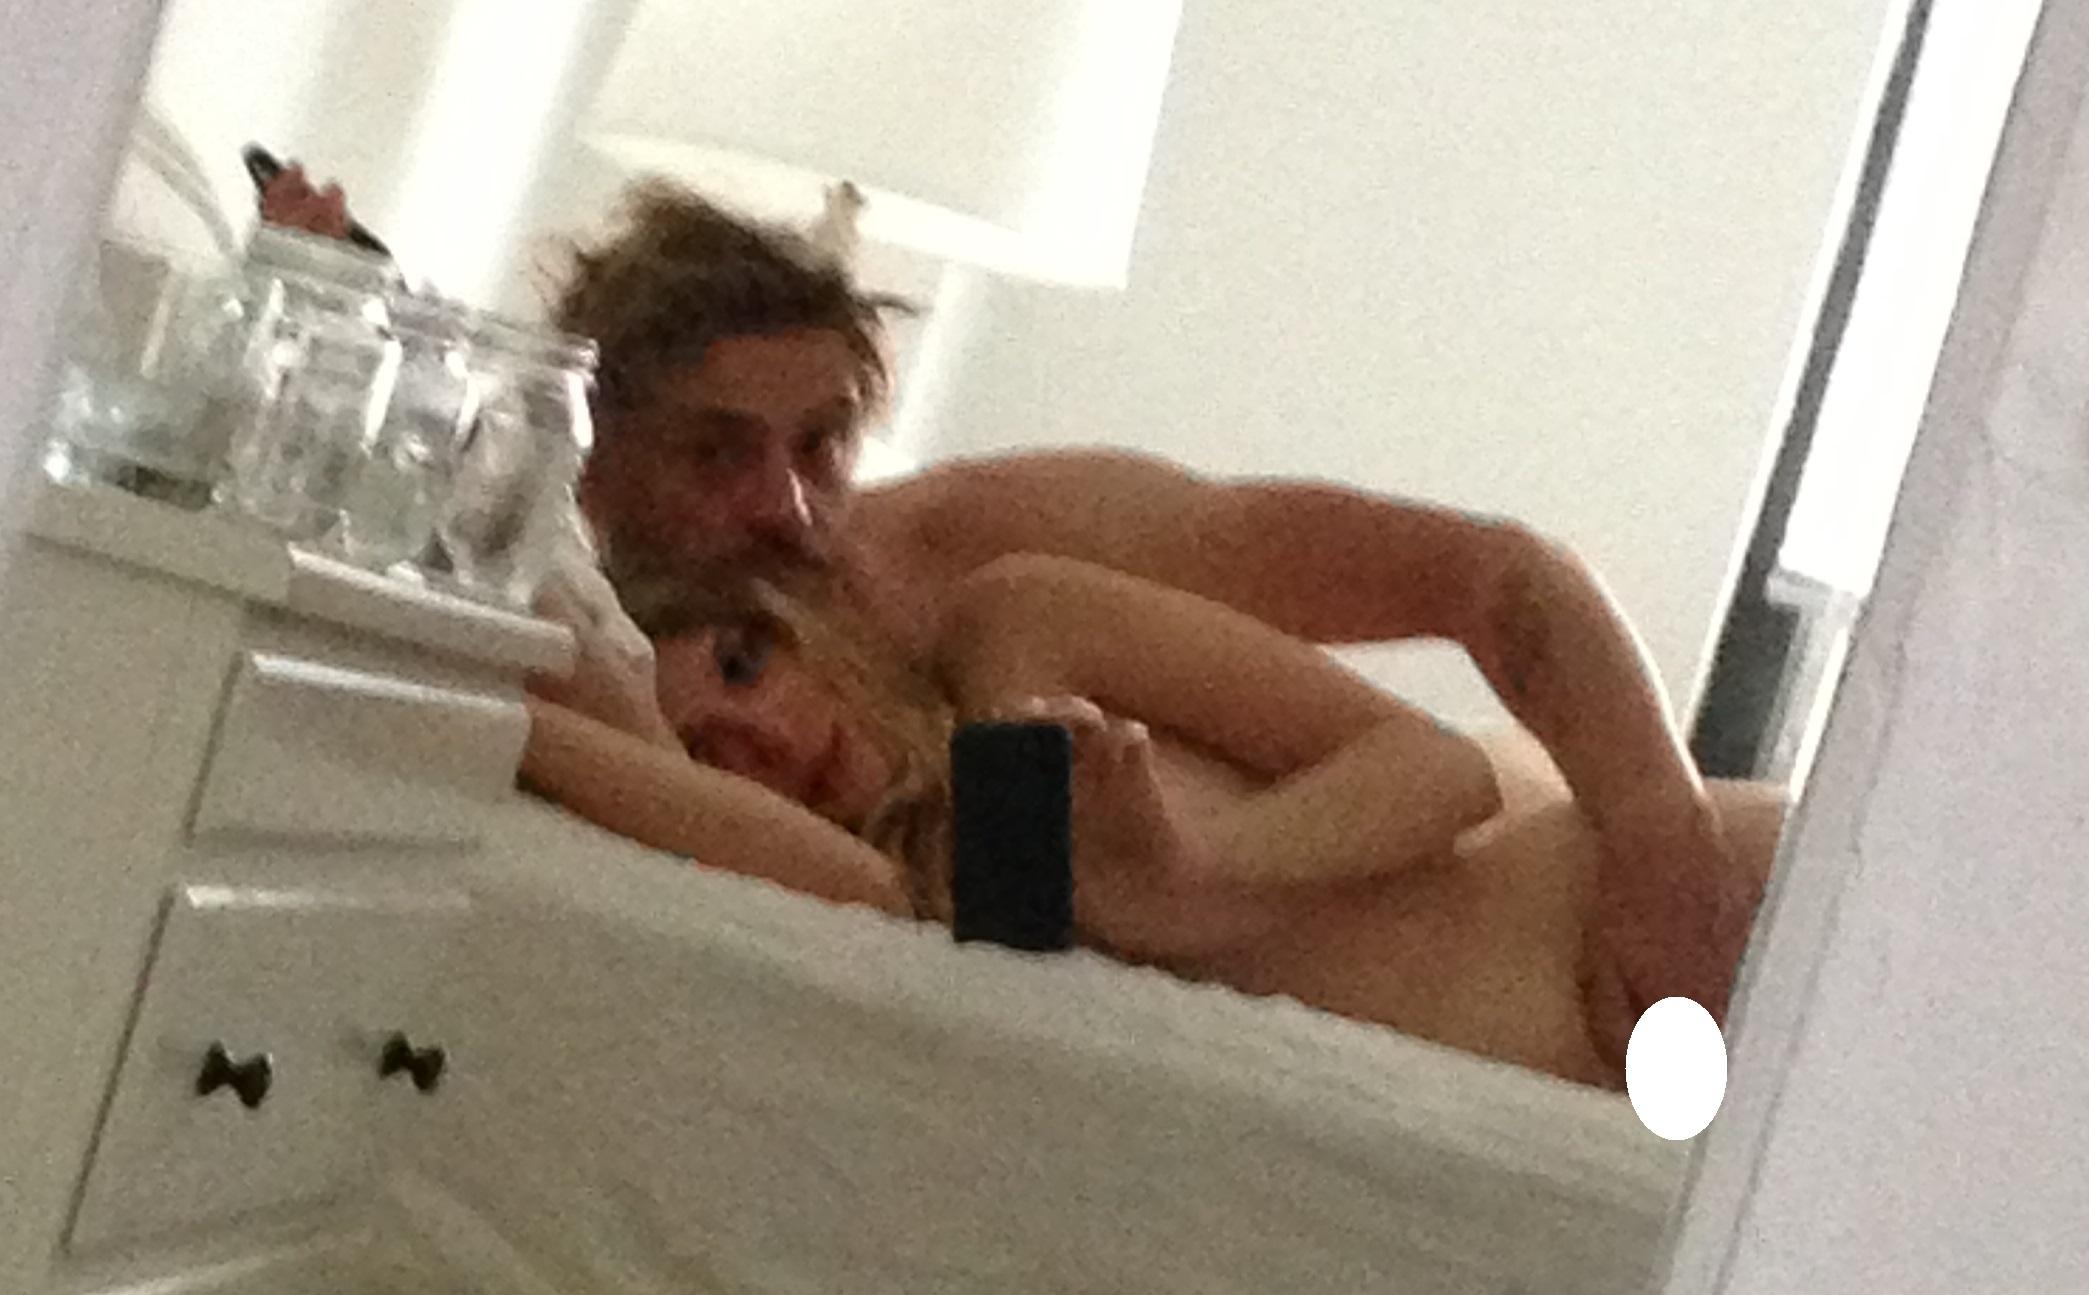 Elizabeth-Olsen-Nude-Sexy-Leaked-TheFappeningBlog.com-3.jpg